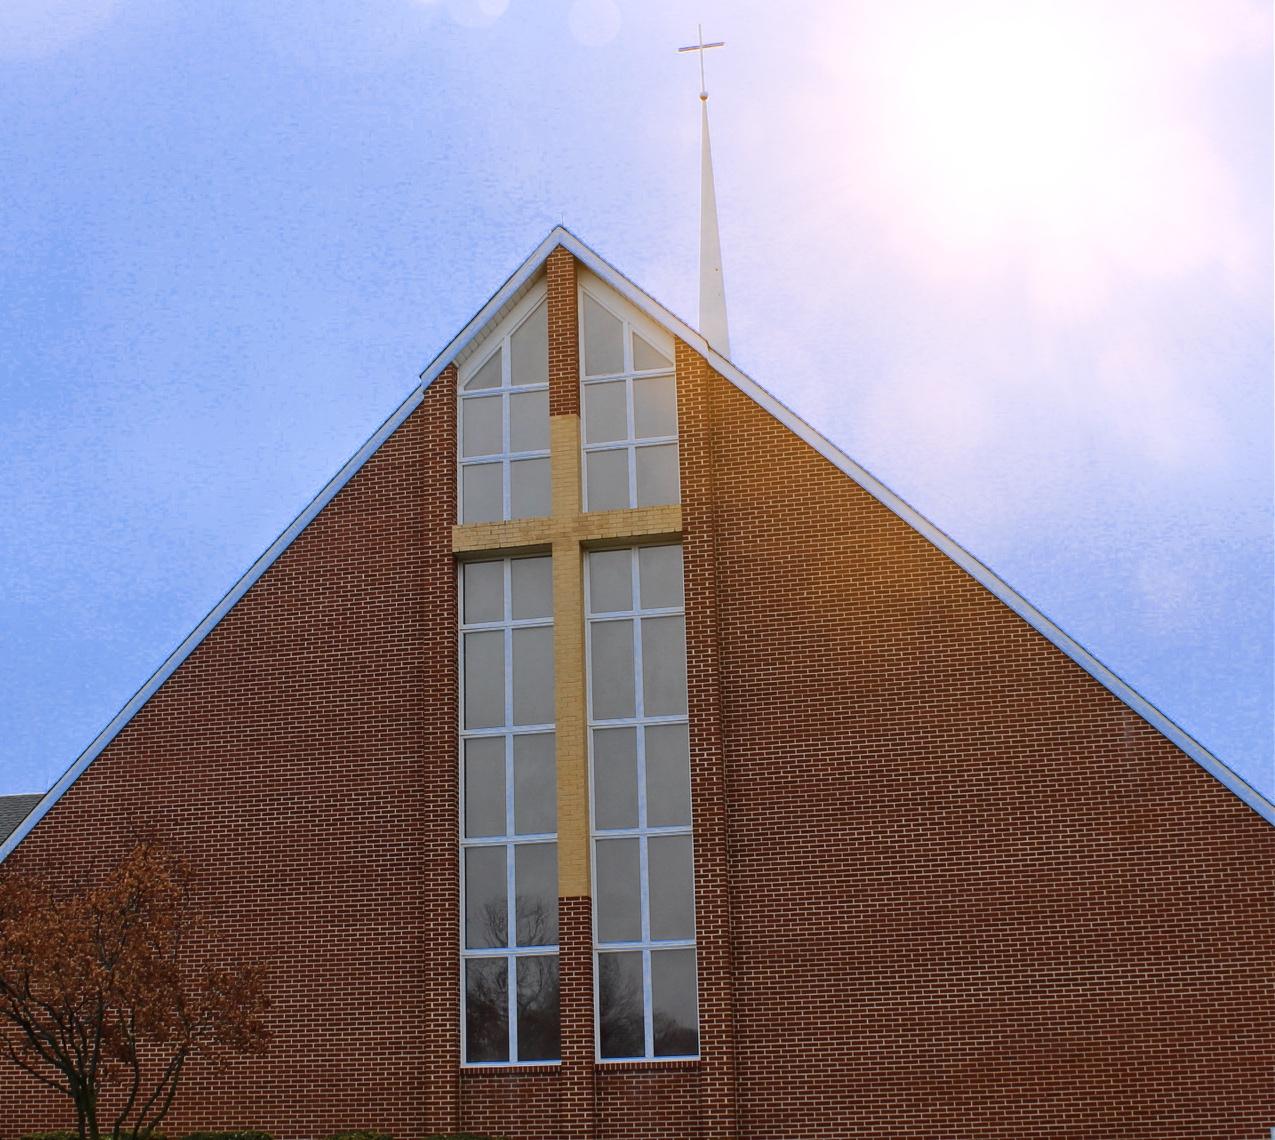 https://www.wileymission.org/uploads/churchfront.jpg